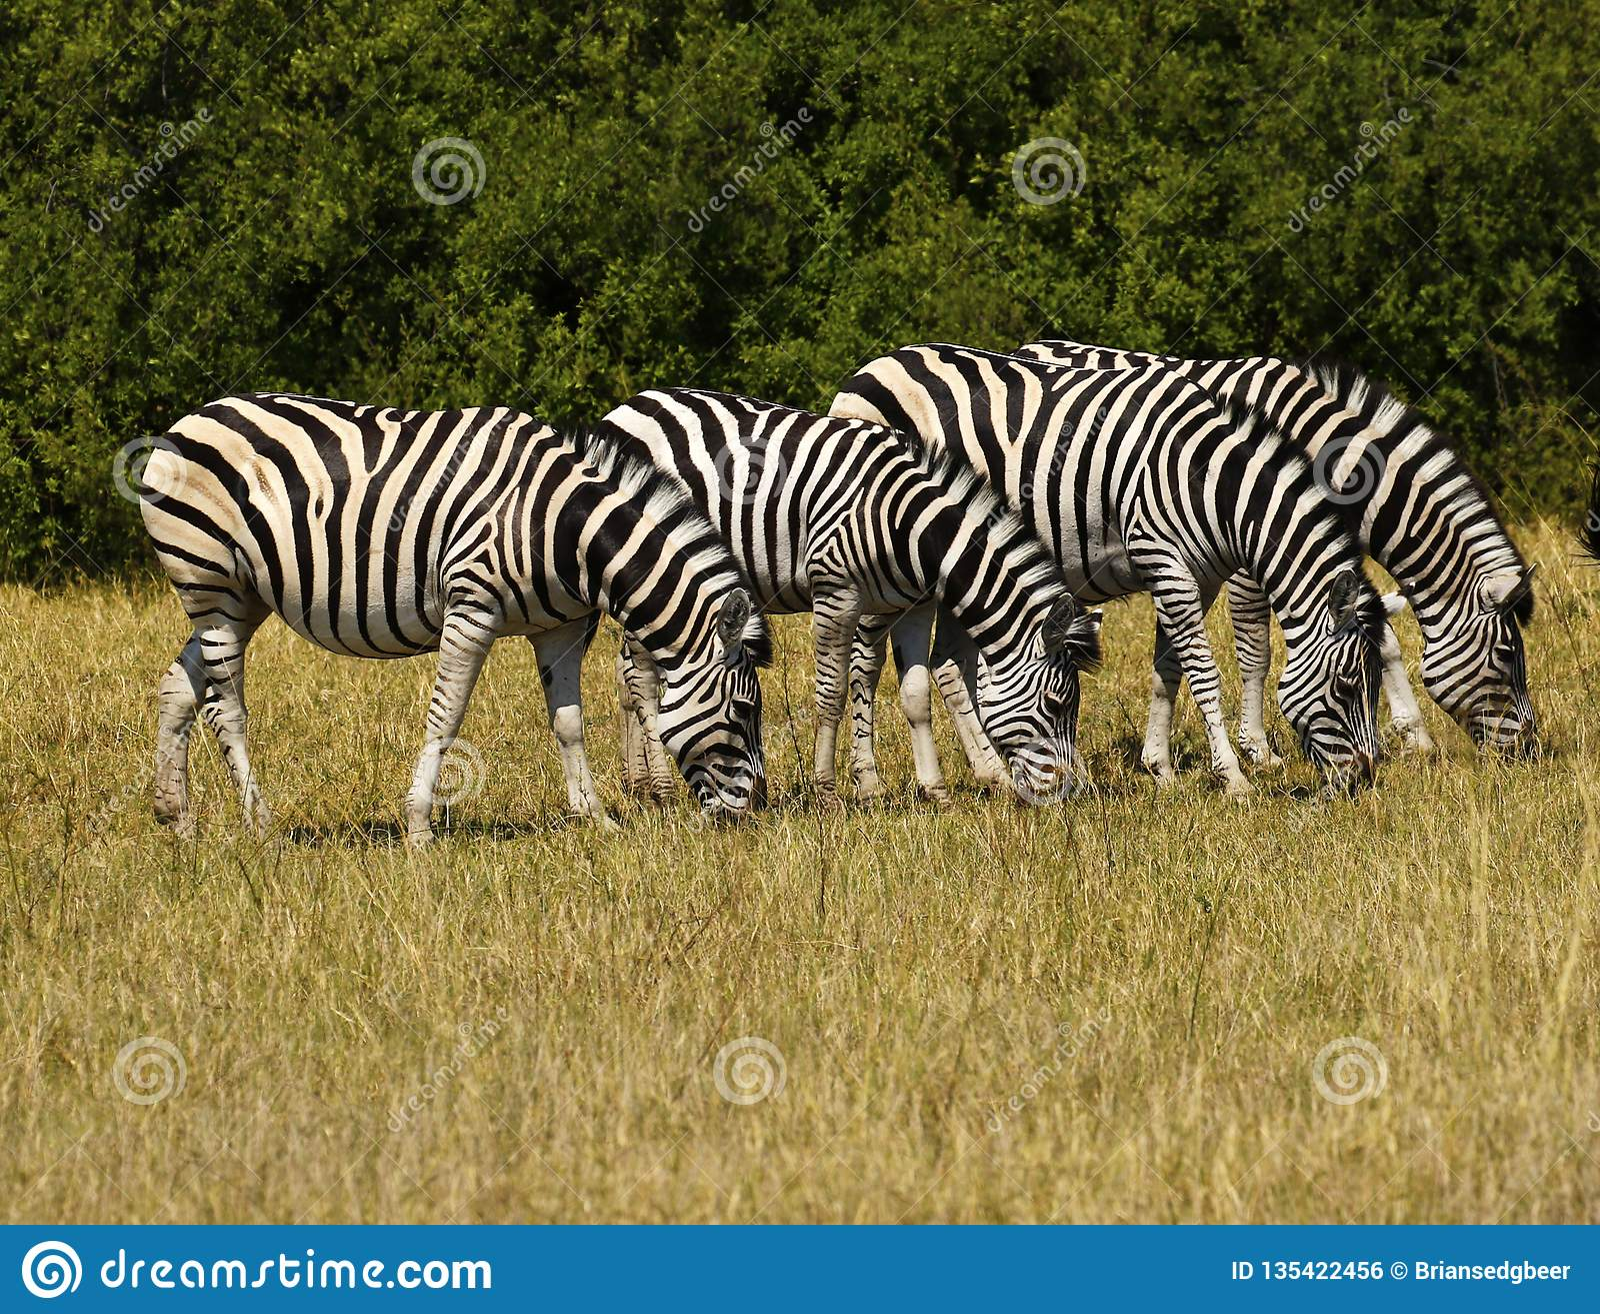 Красивая зебра Waterbucks и Burchell на африканских равнинах